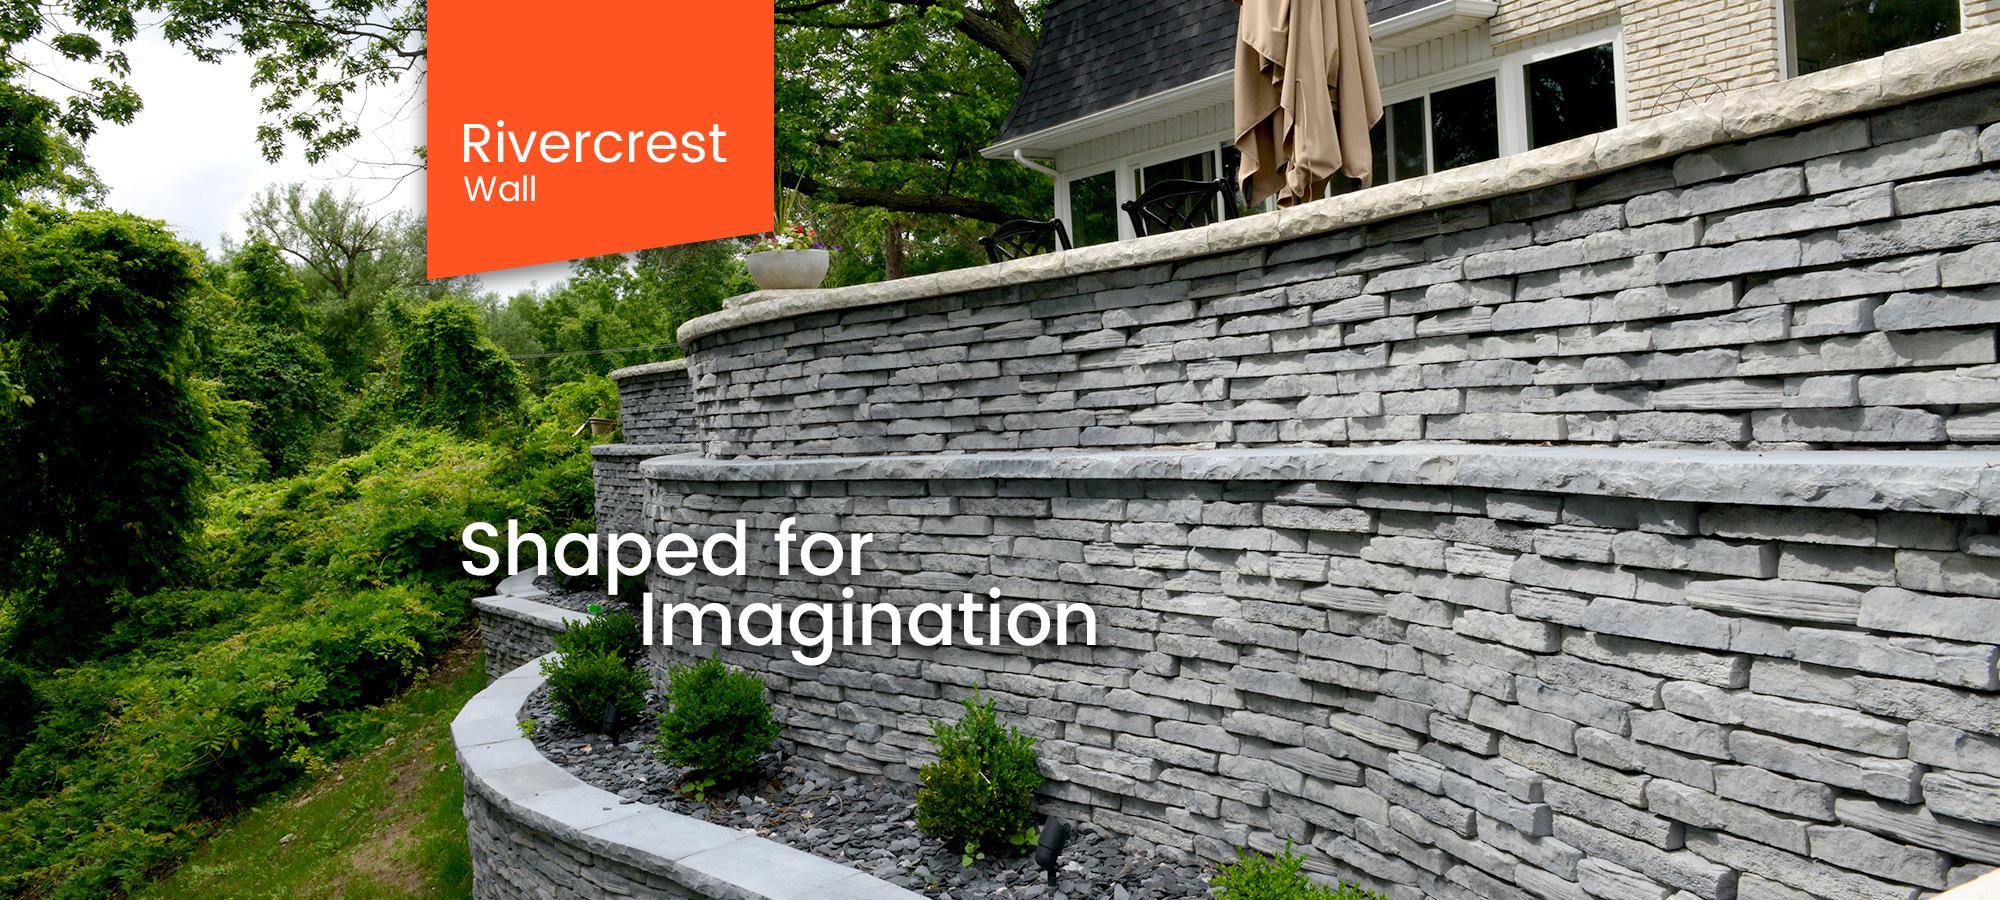 Rivercrest Wall